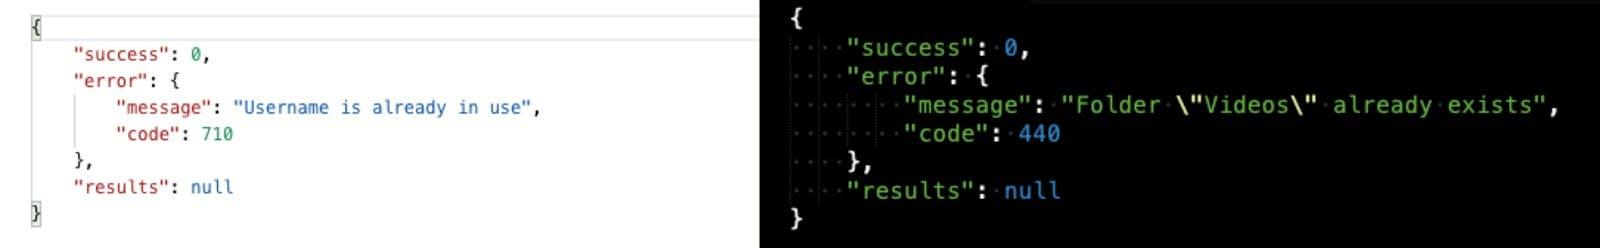 Sample of better error messages.